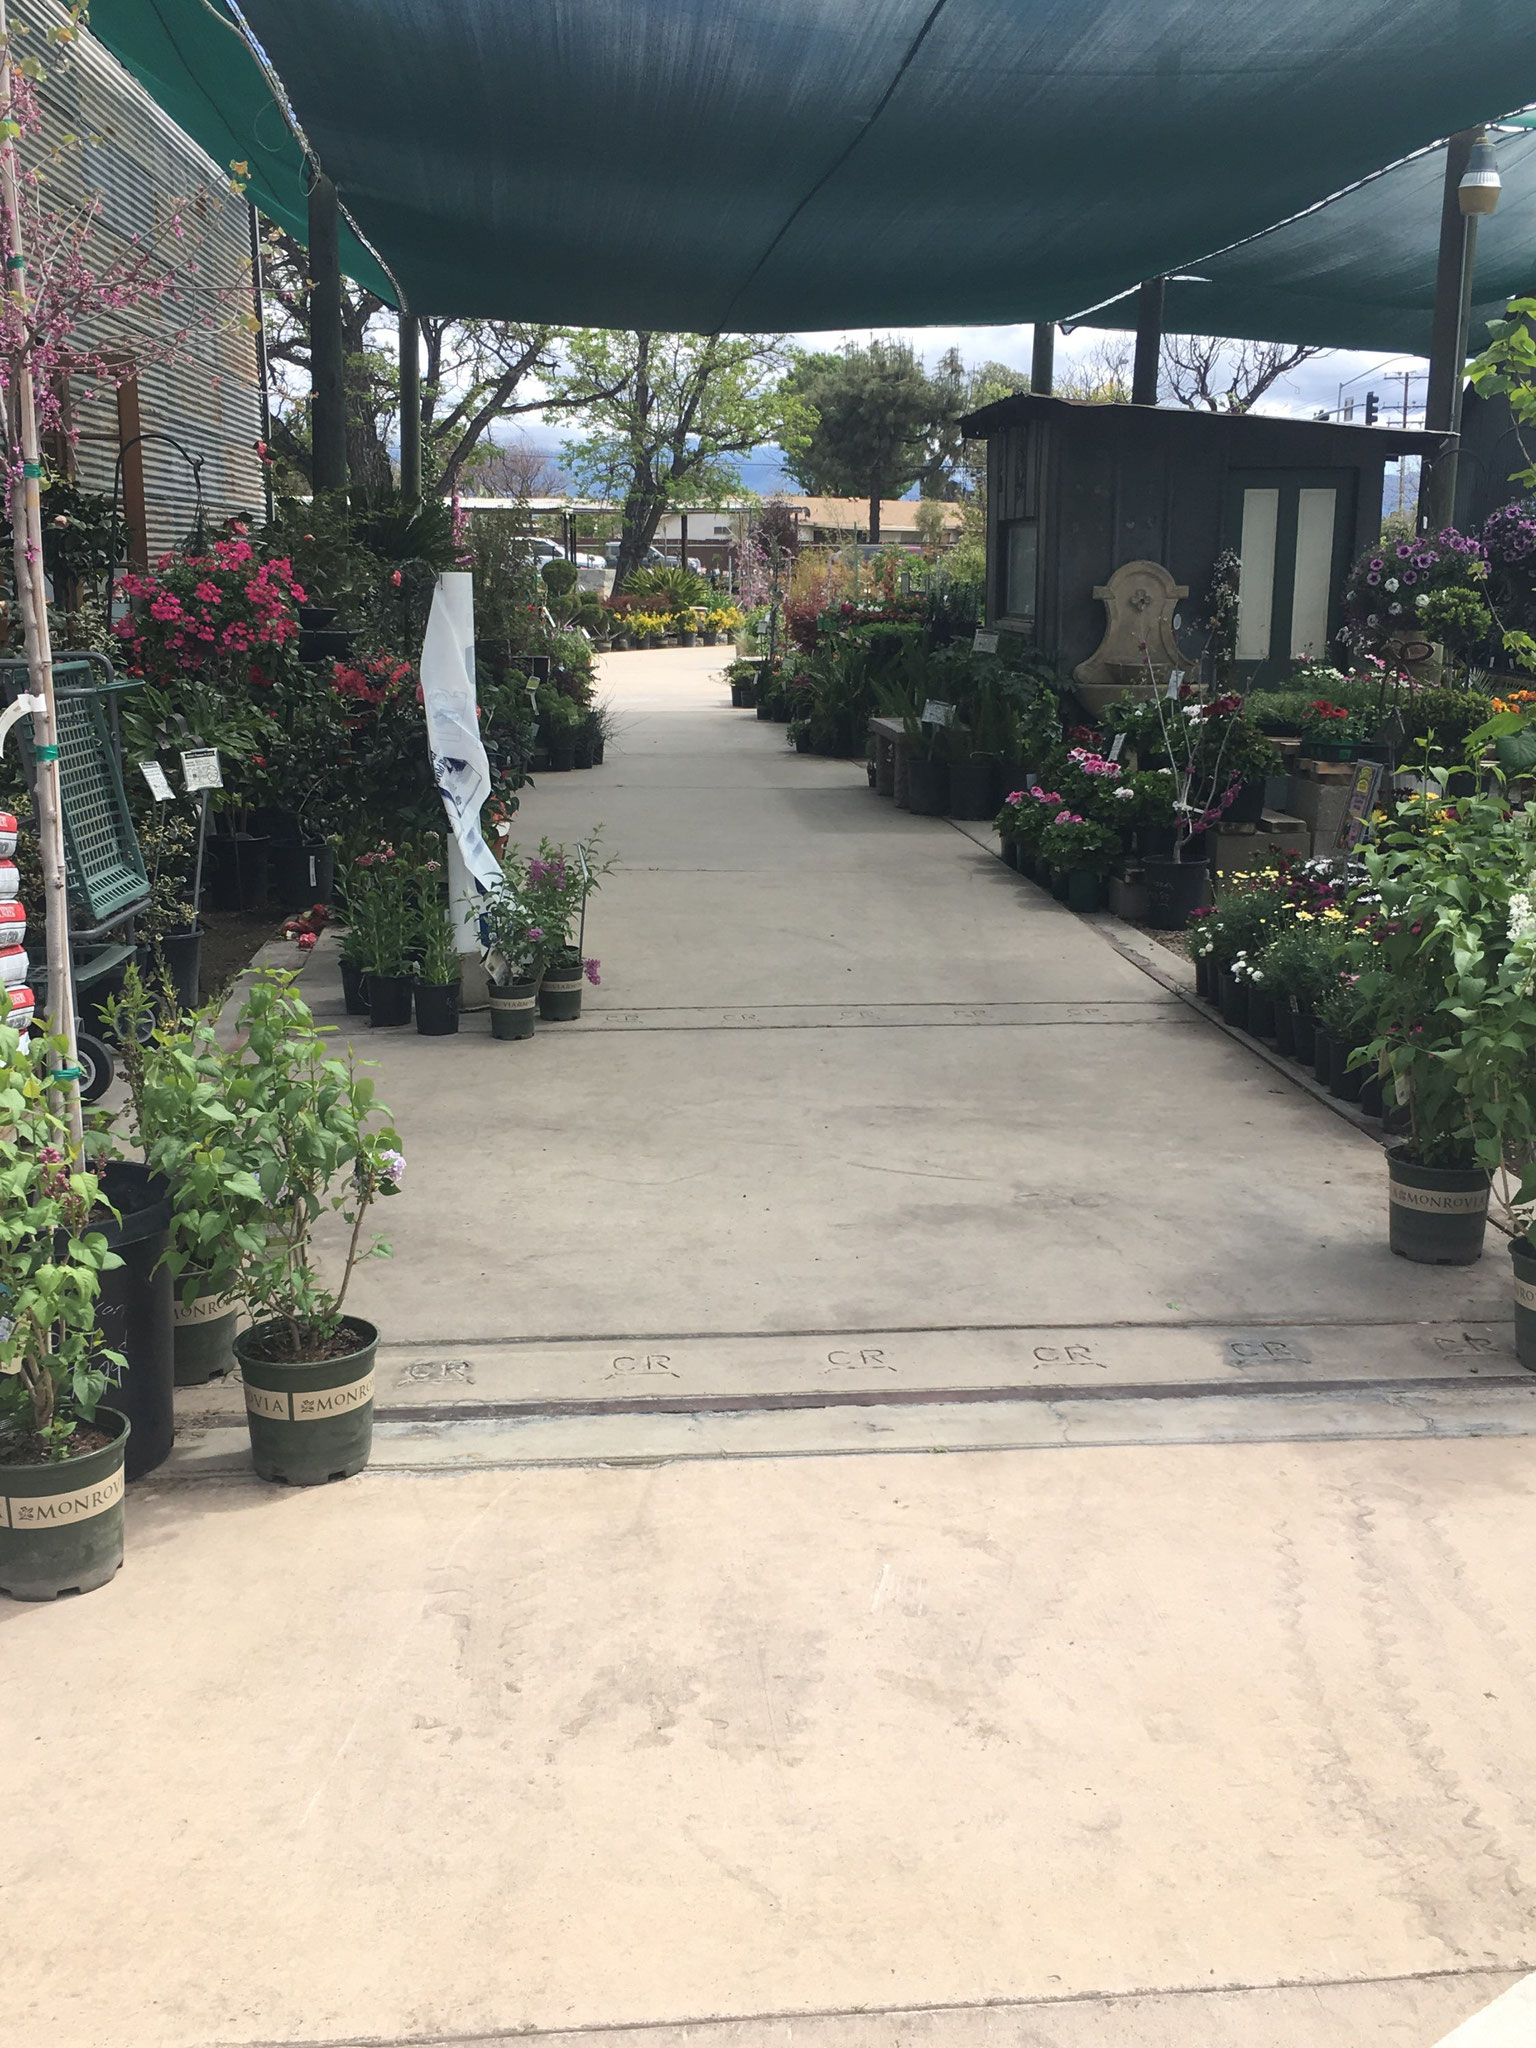 Cagliero Ranch Nursery Official Site- Hemet, C A - Quality